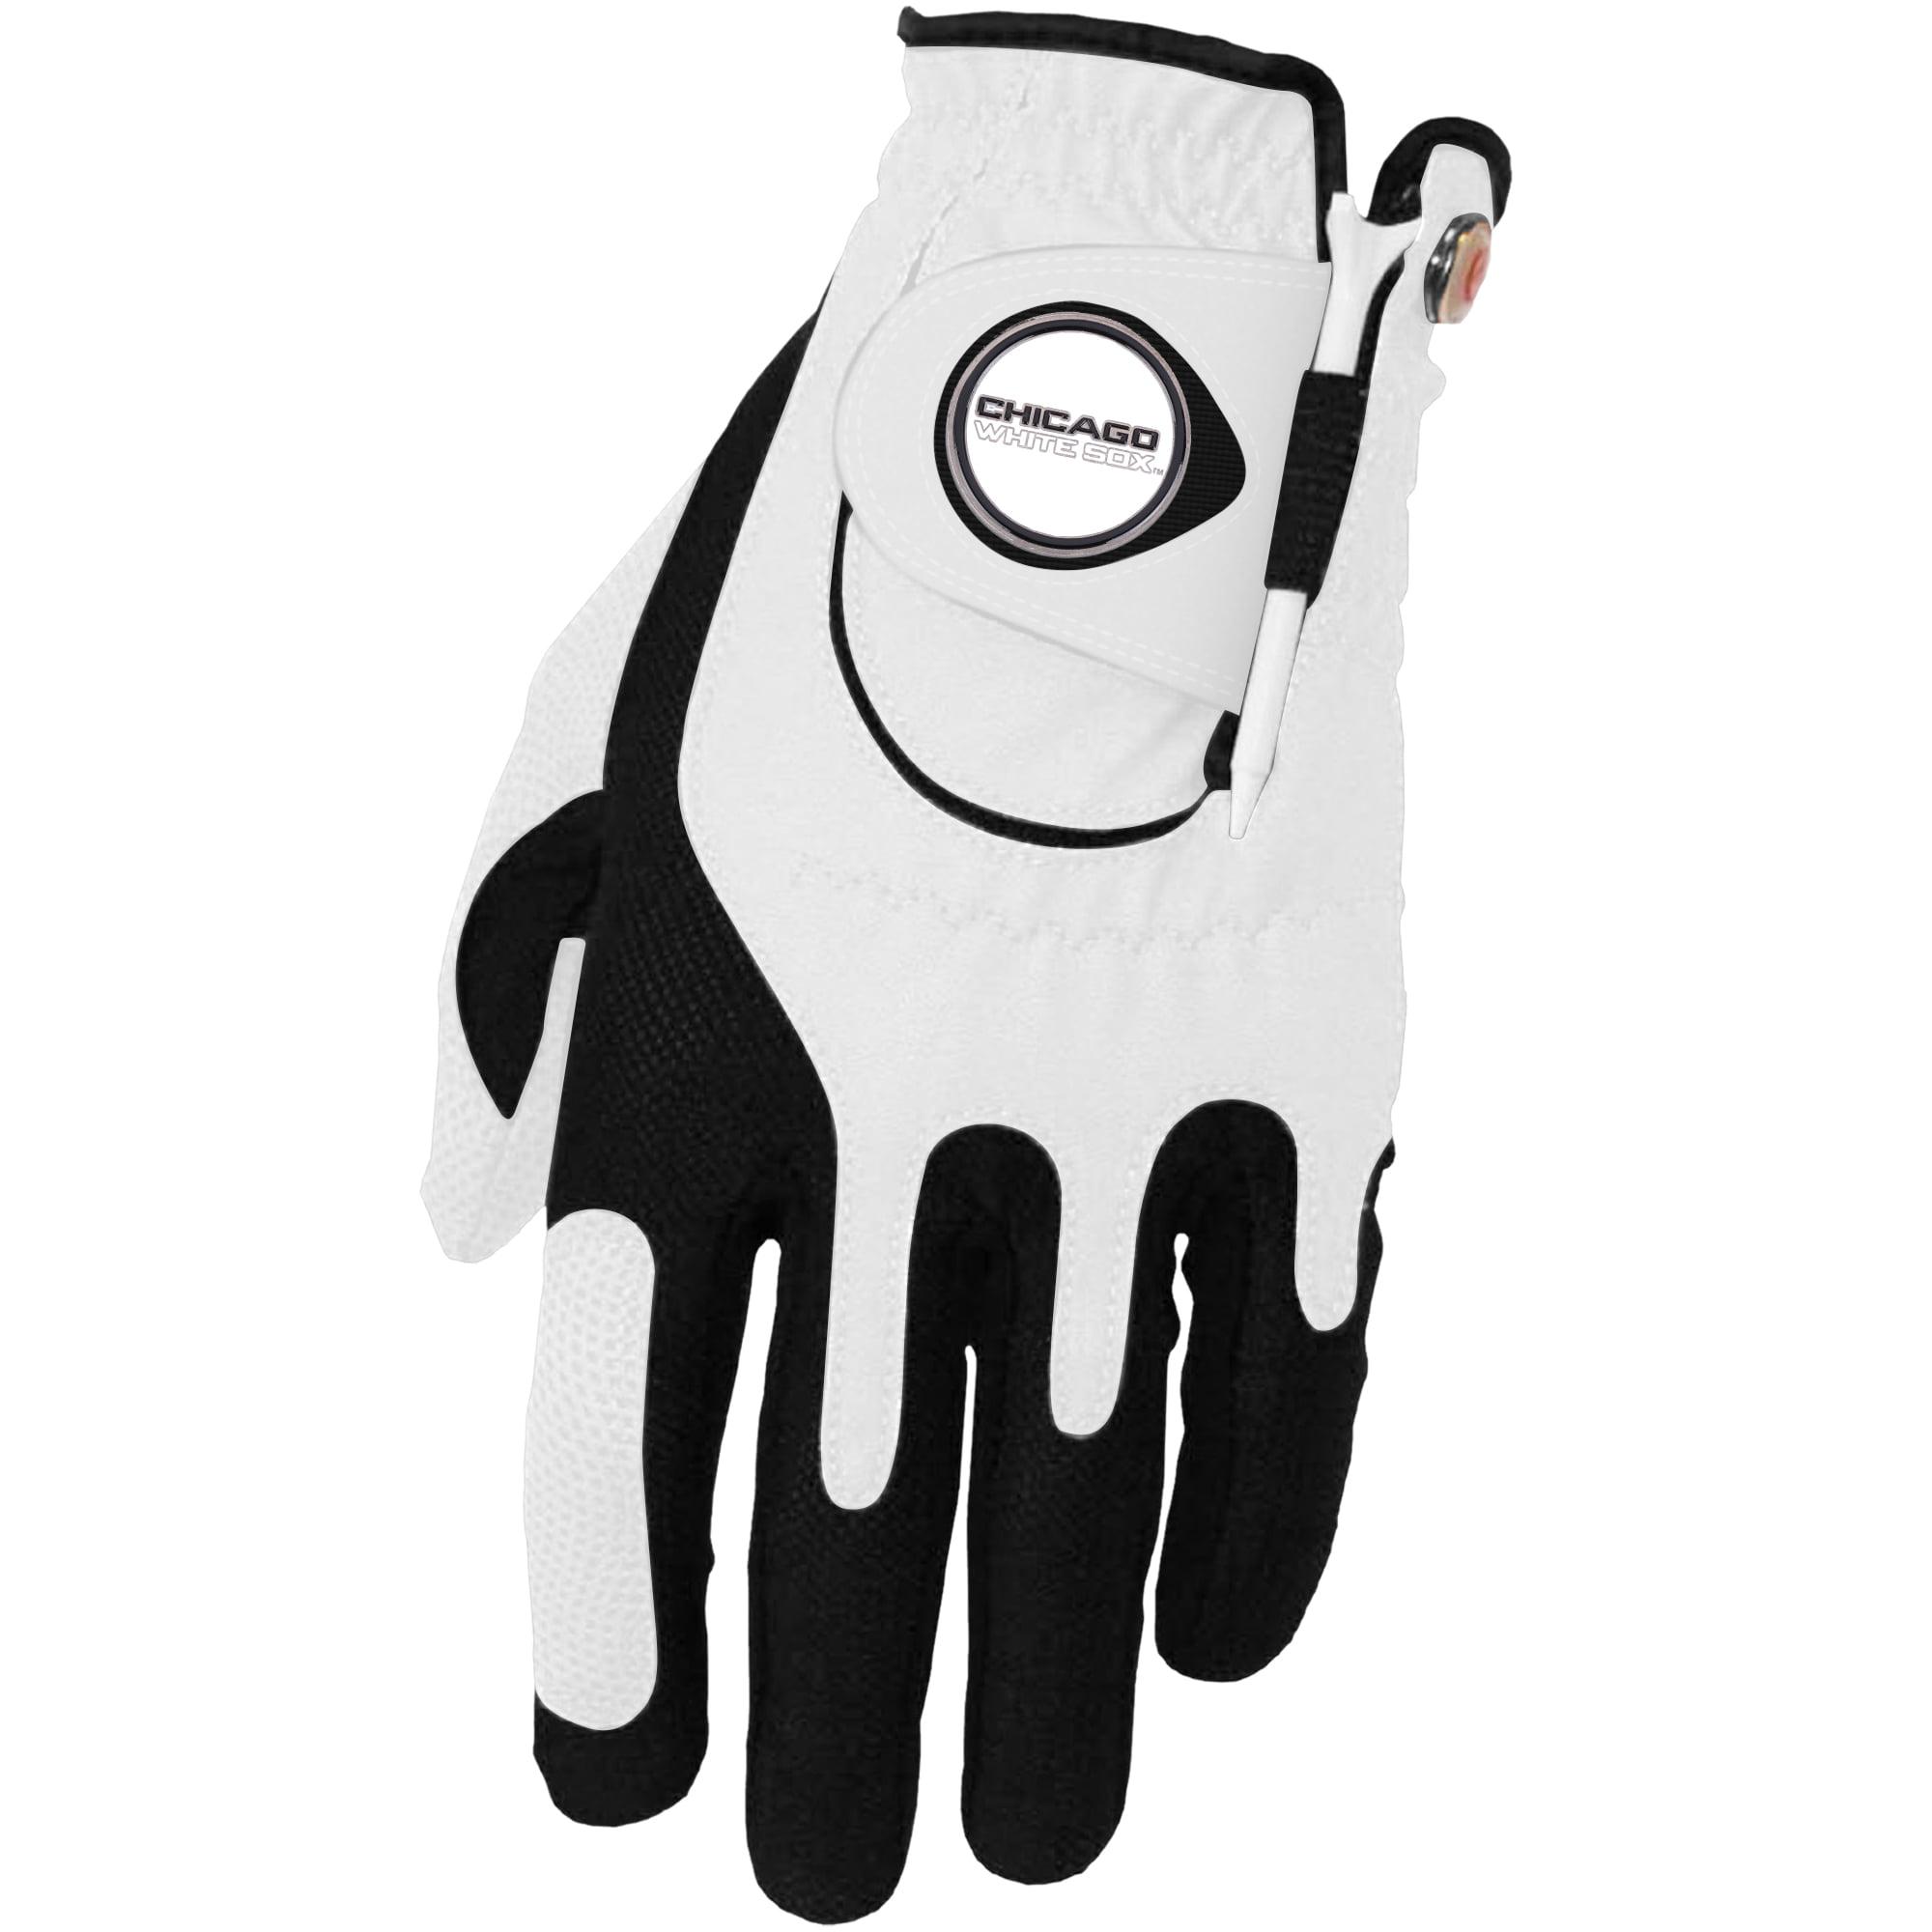 Chicago White Sox Left Hand Golf Glove & Ball Marker Set - White - OSFM